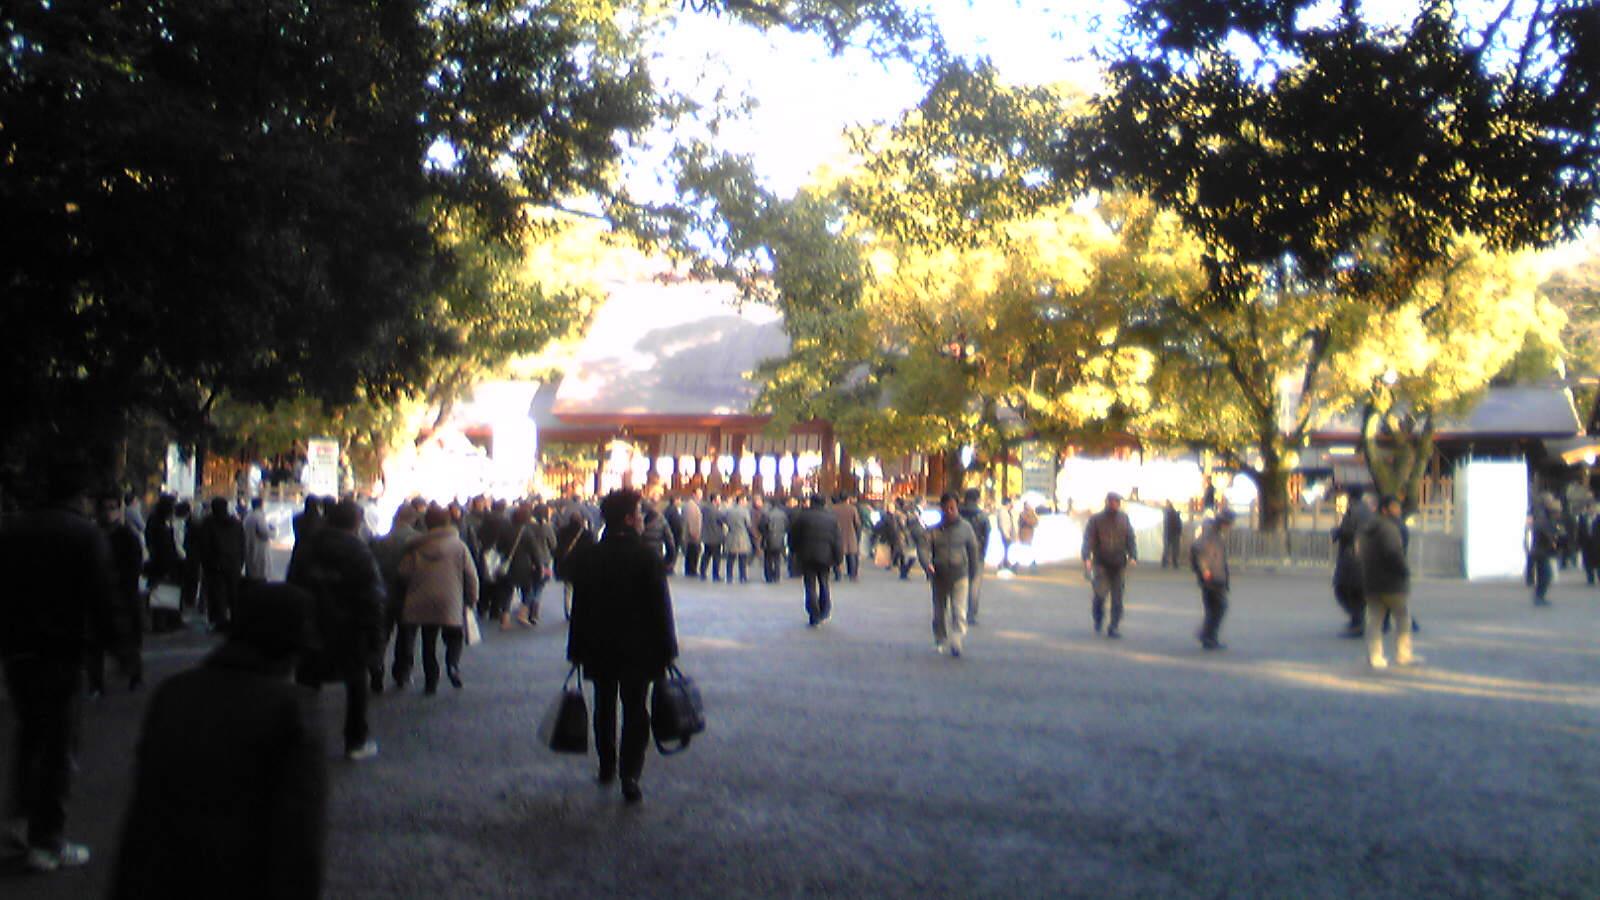 20110106-Image1720.jpg